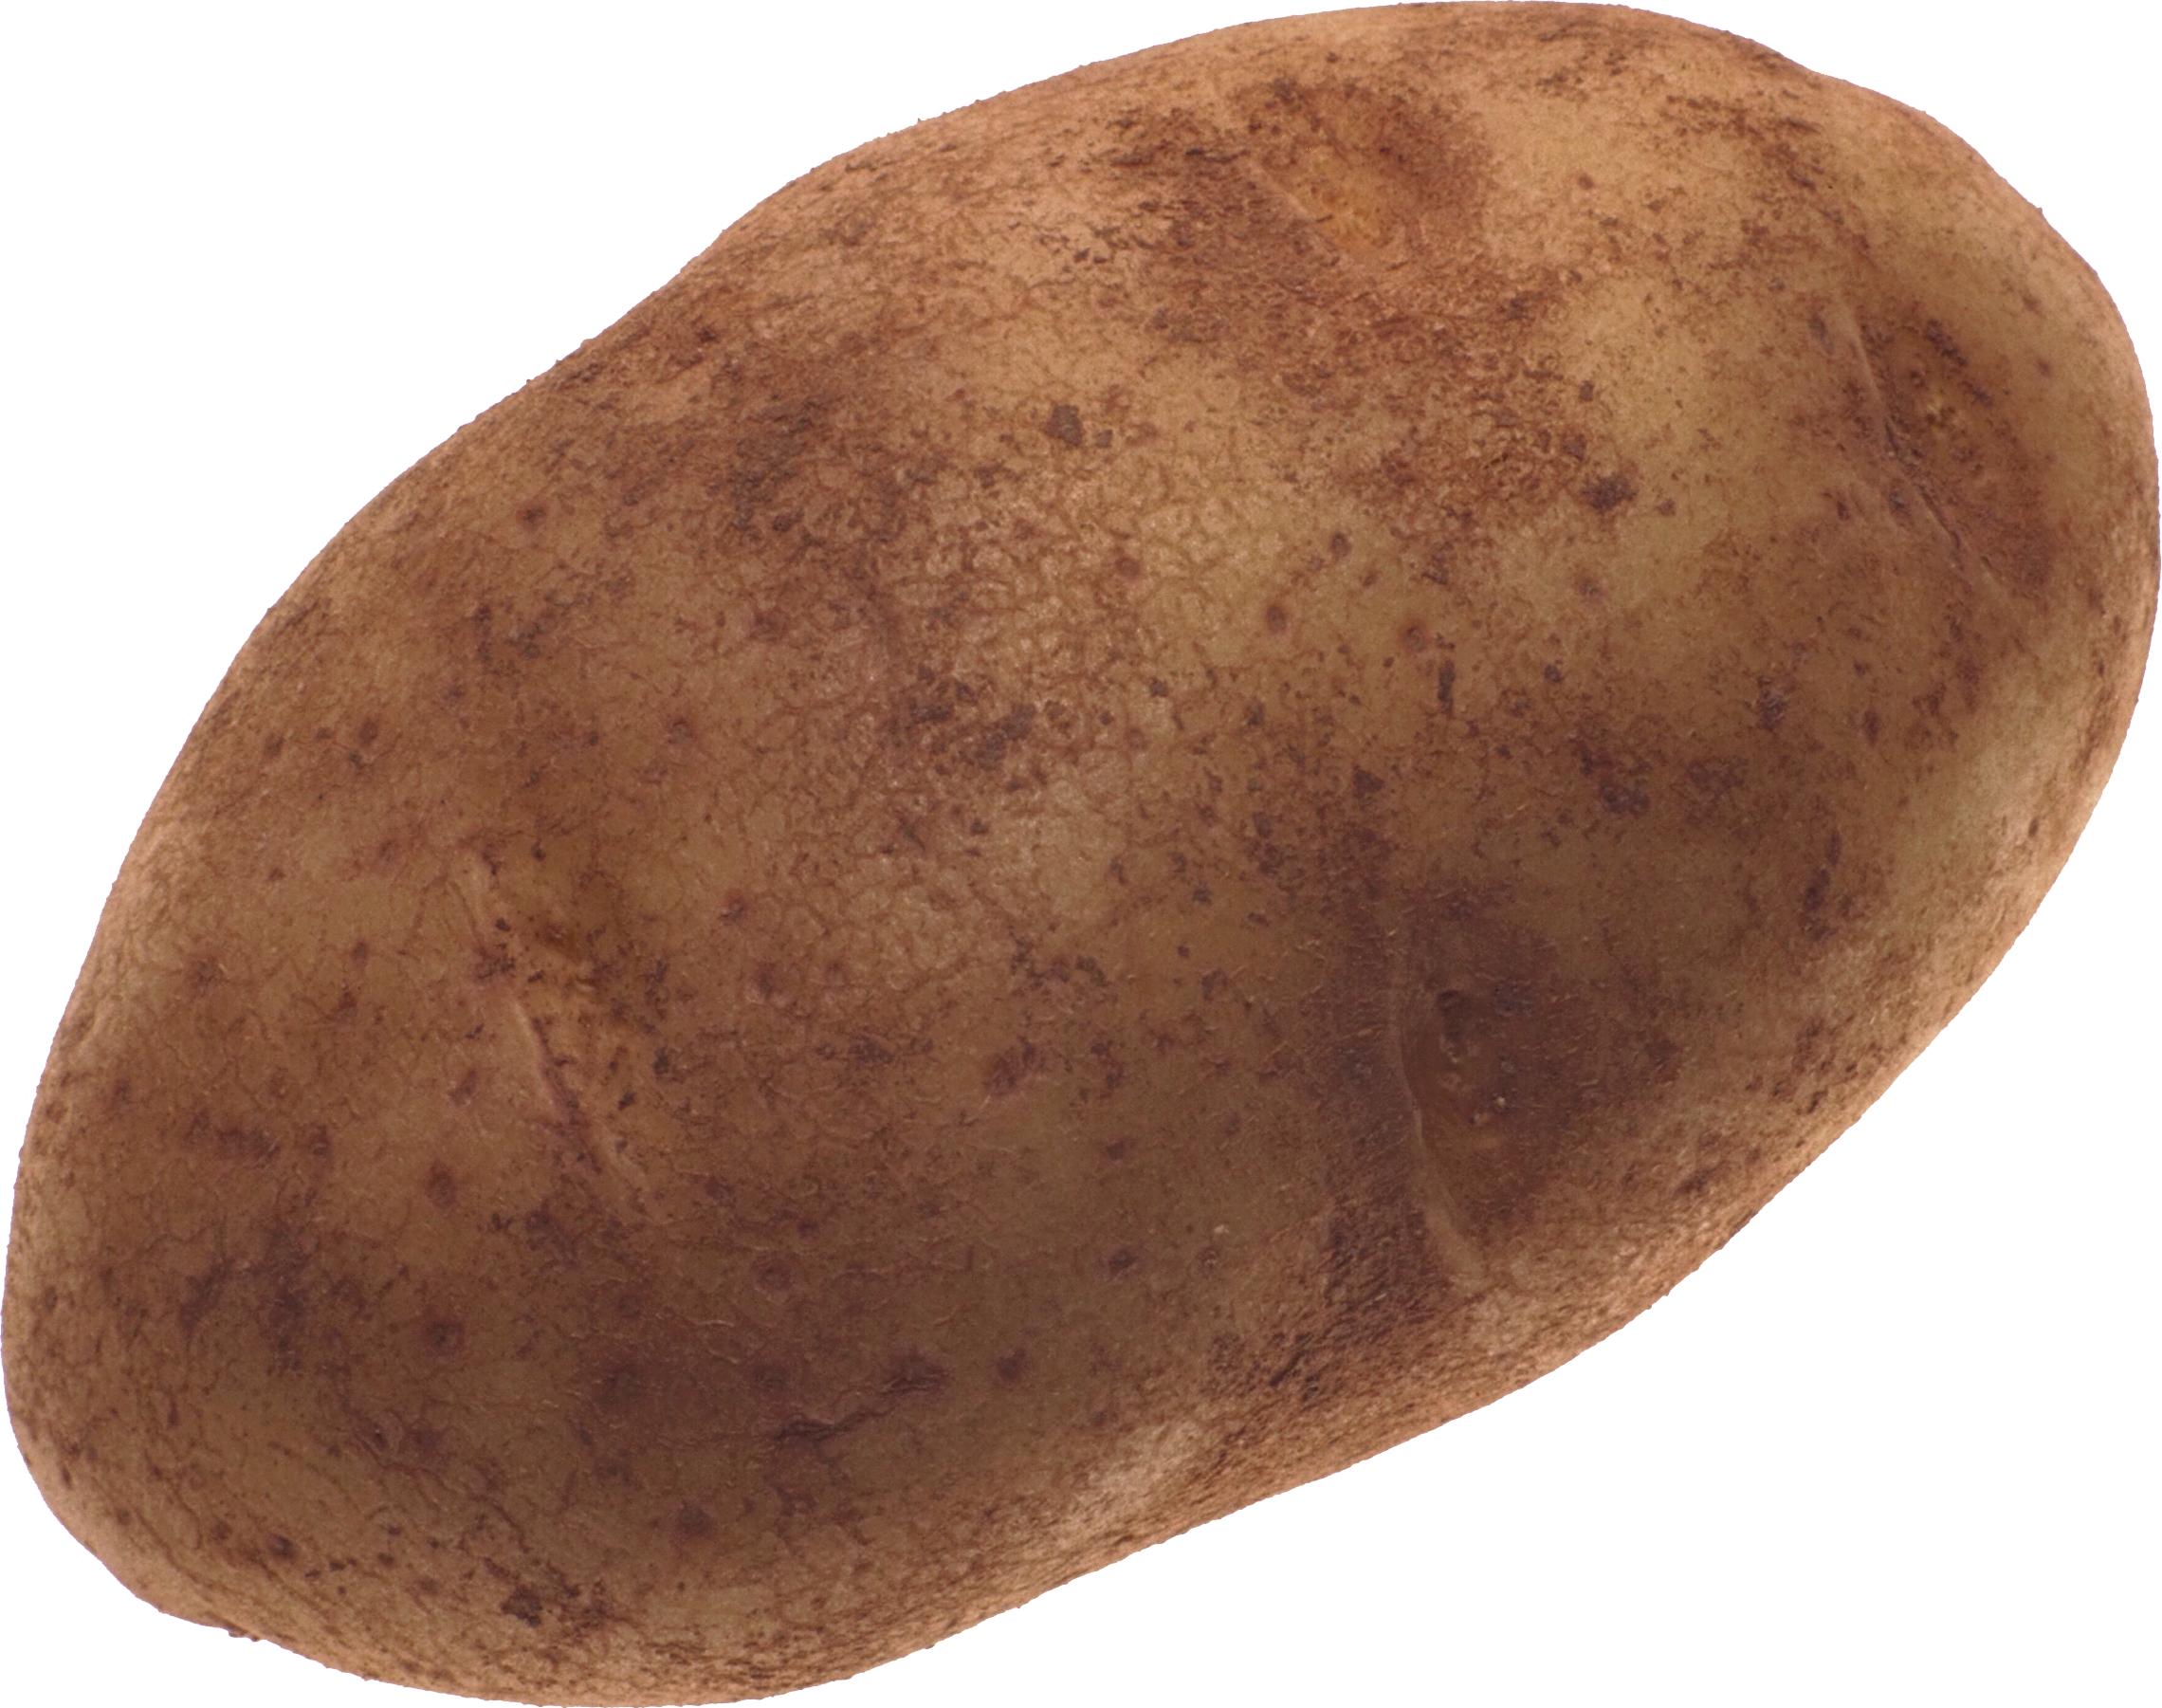 Clipart vegetables potato. High quality png web